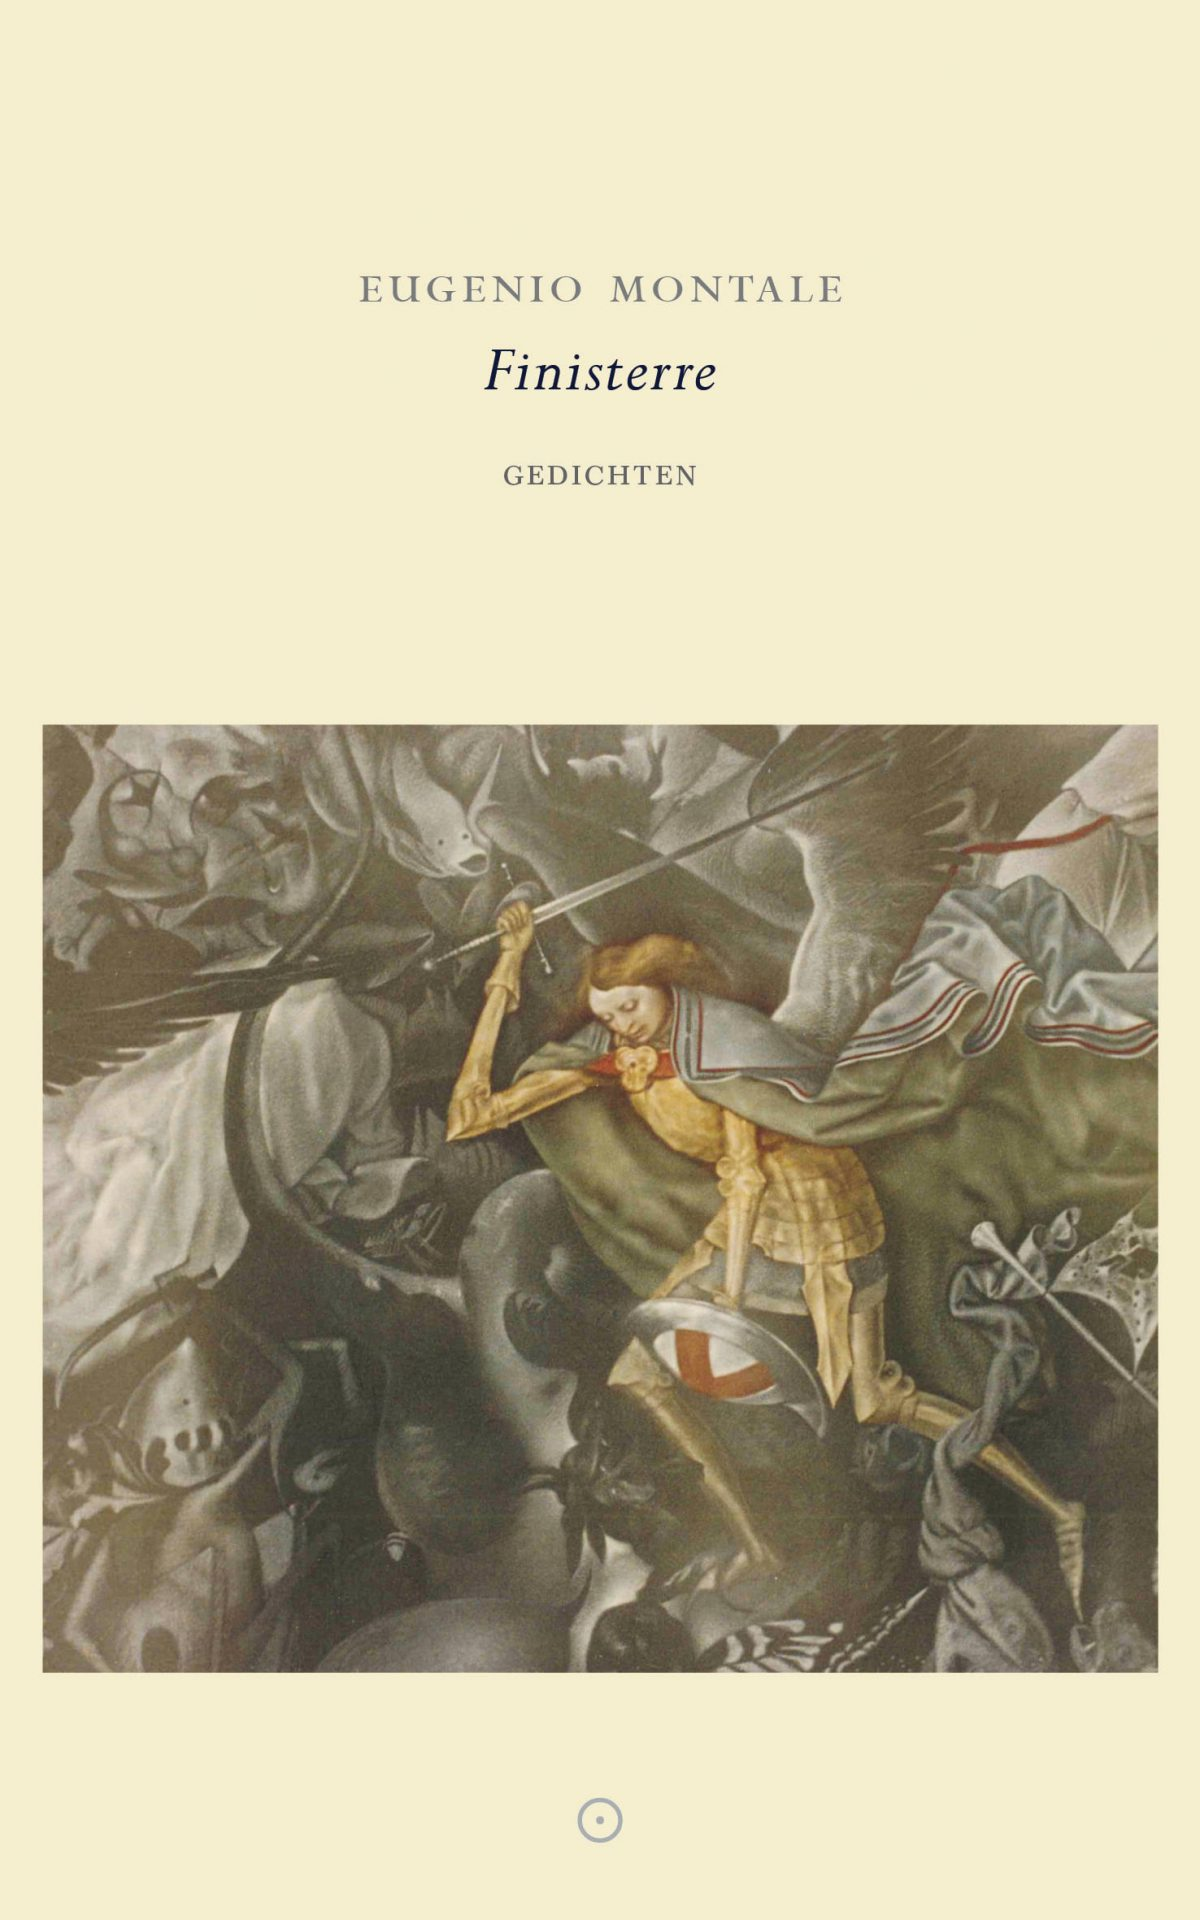 Finisterre – Eugenio Montale